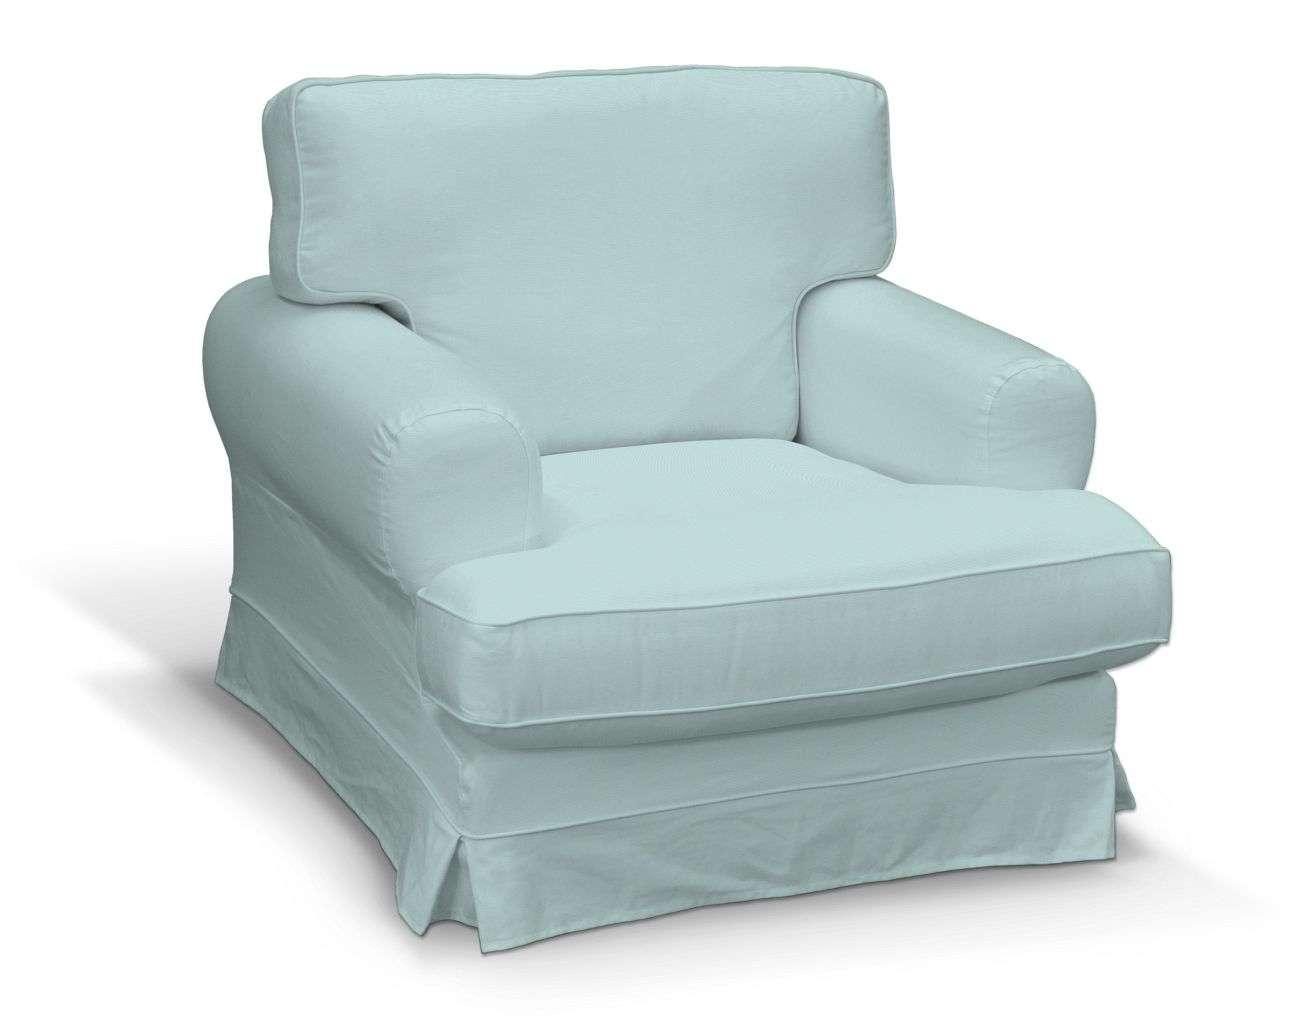 Ekeskog Sesselbezug von der Kollektion Cotton Panama, Stoff: 702-10